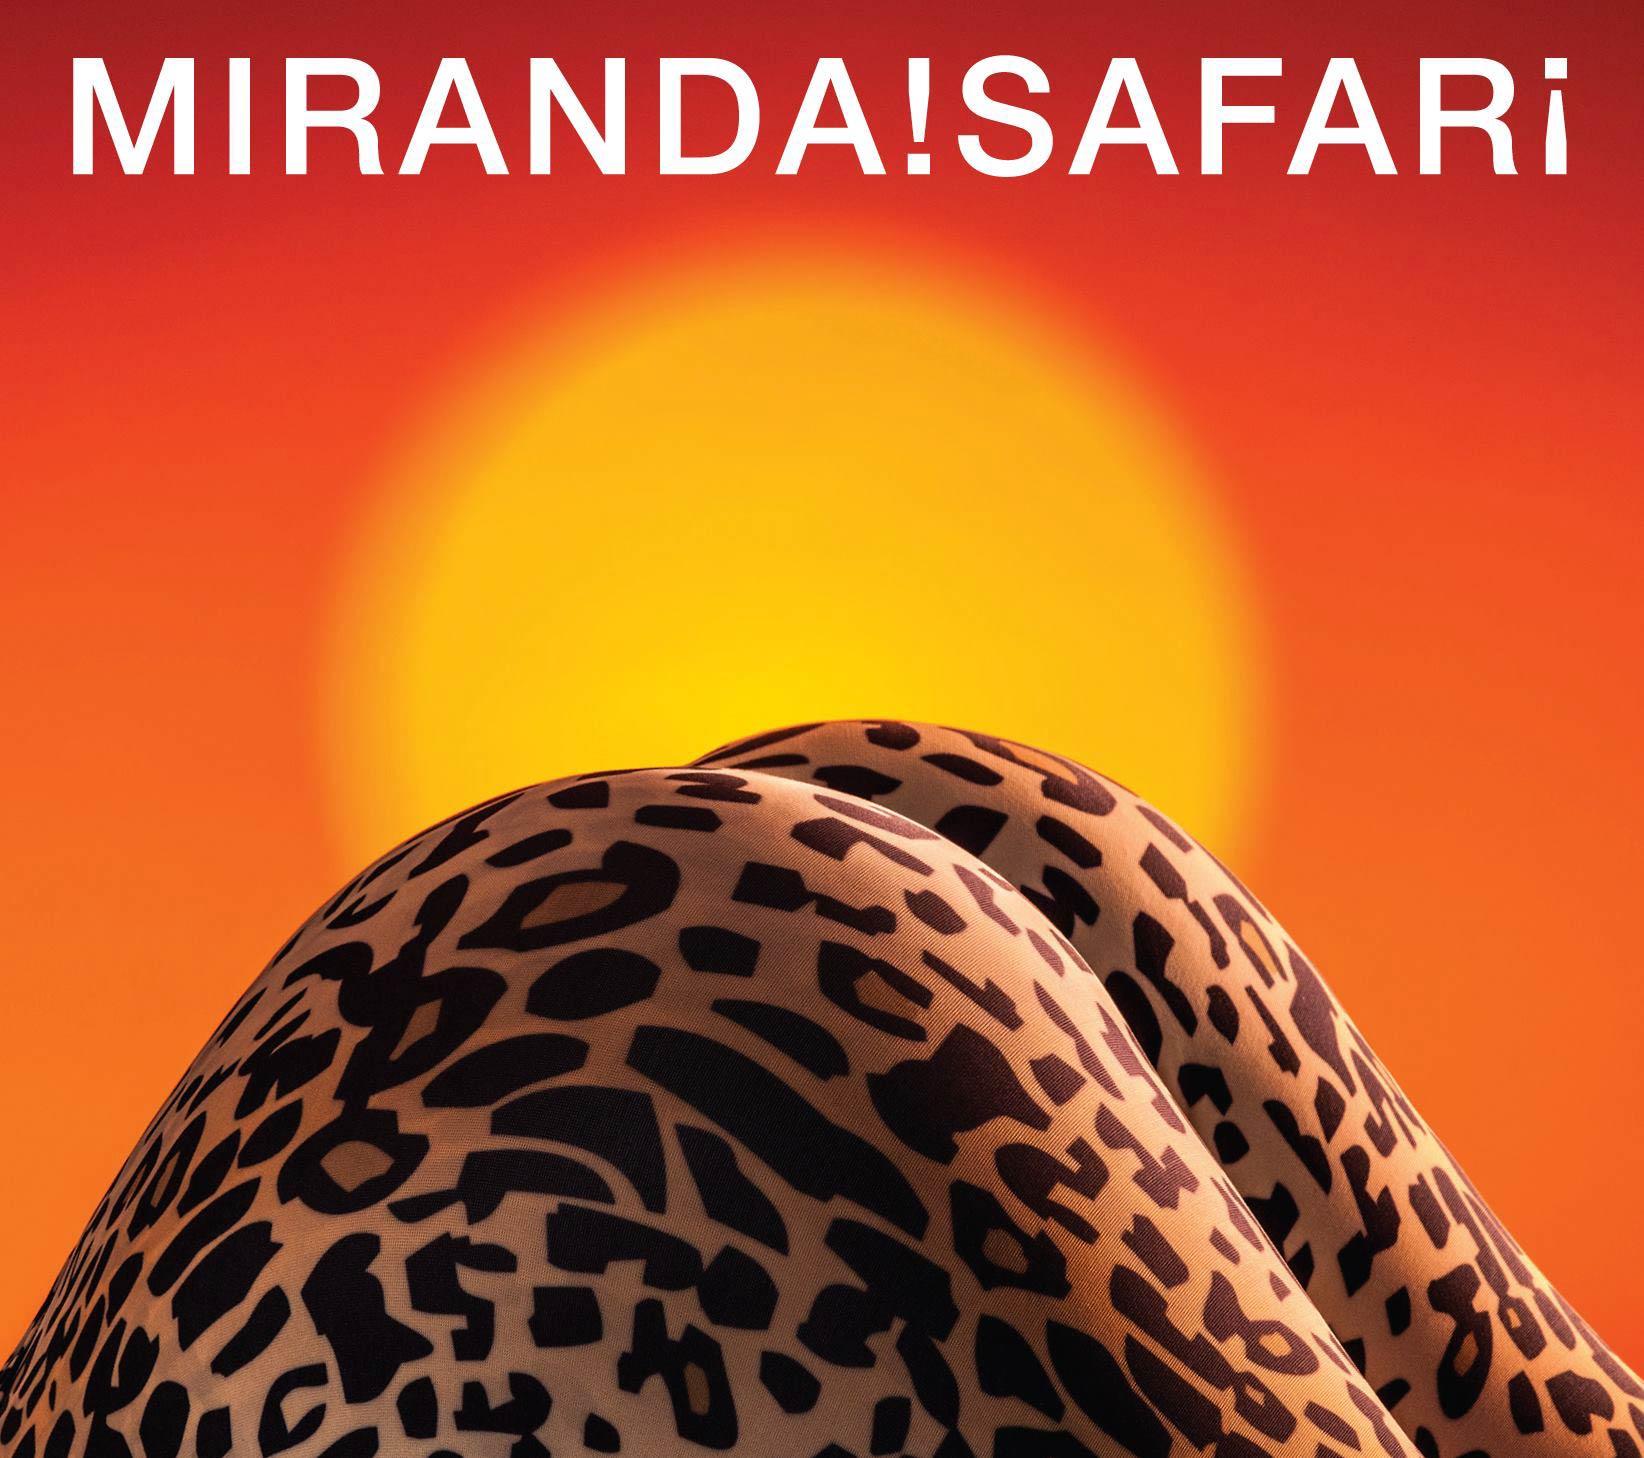 Lana del rey avril lavigne amp kesha rose uncensored - 2 10